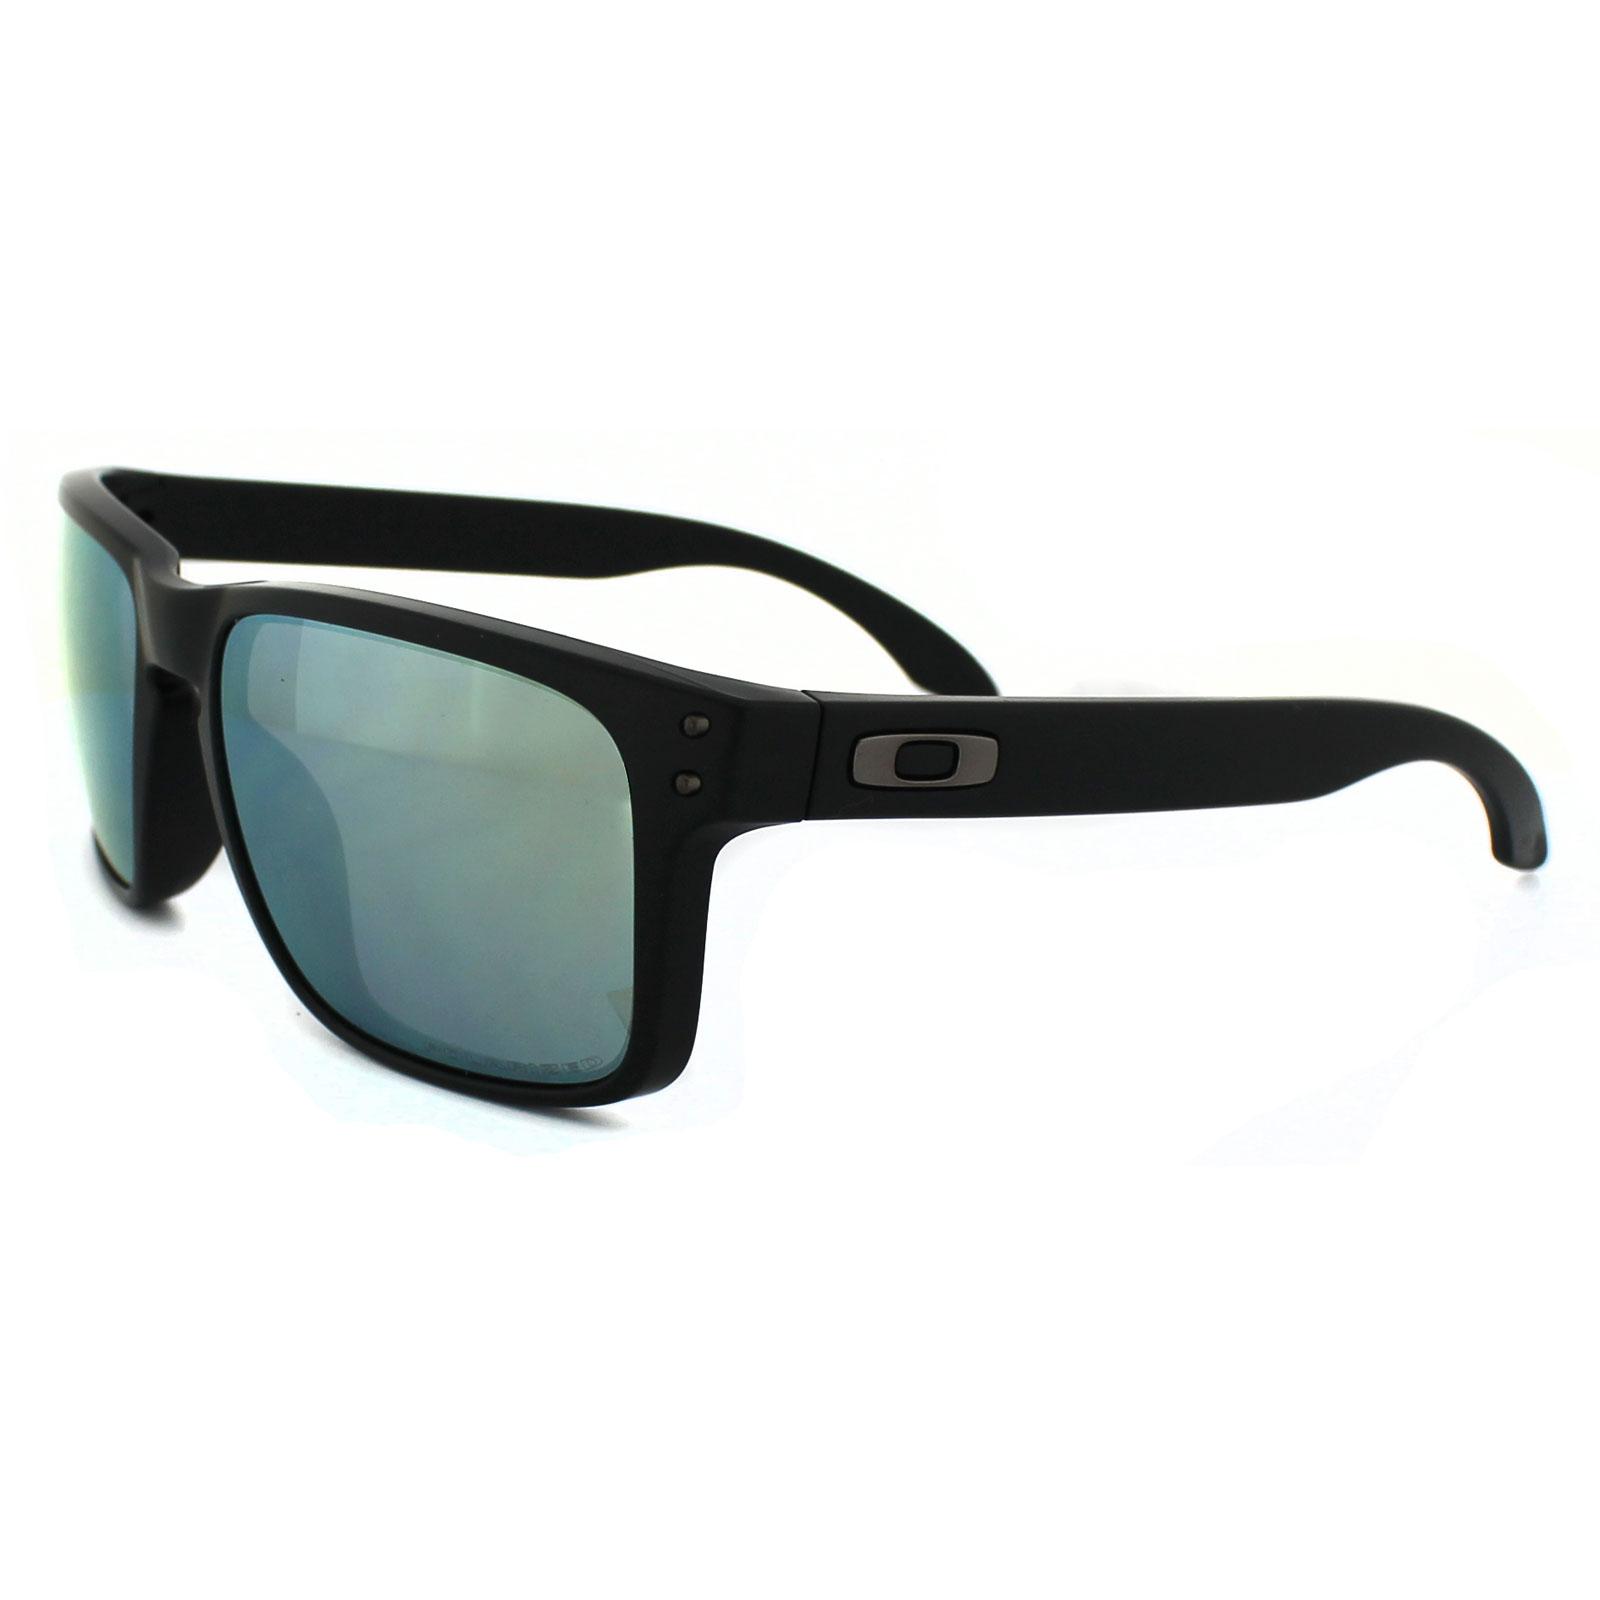 black friday oakley sunglasses 8z2e  Sentinel Oakley Sunglasses Holbrook OO9102-50 Matt Black Emerald Iridium  Polarized